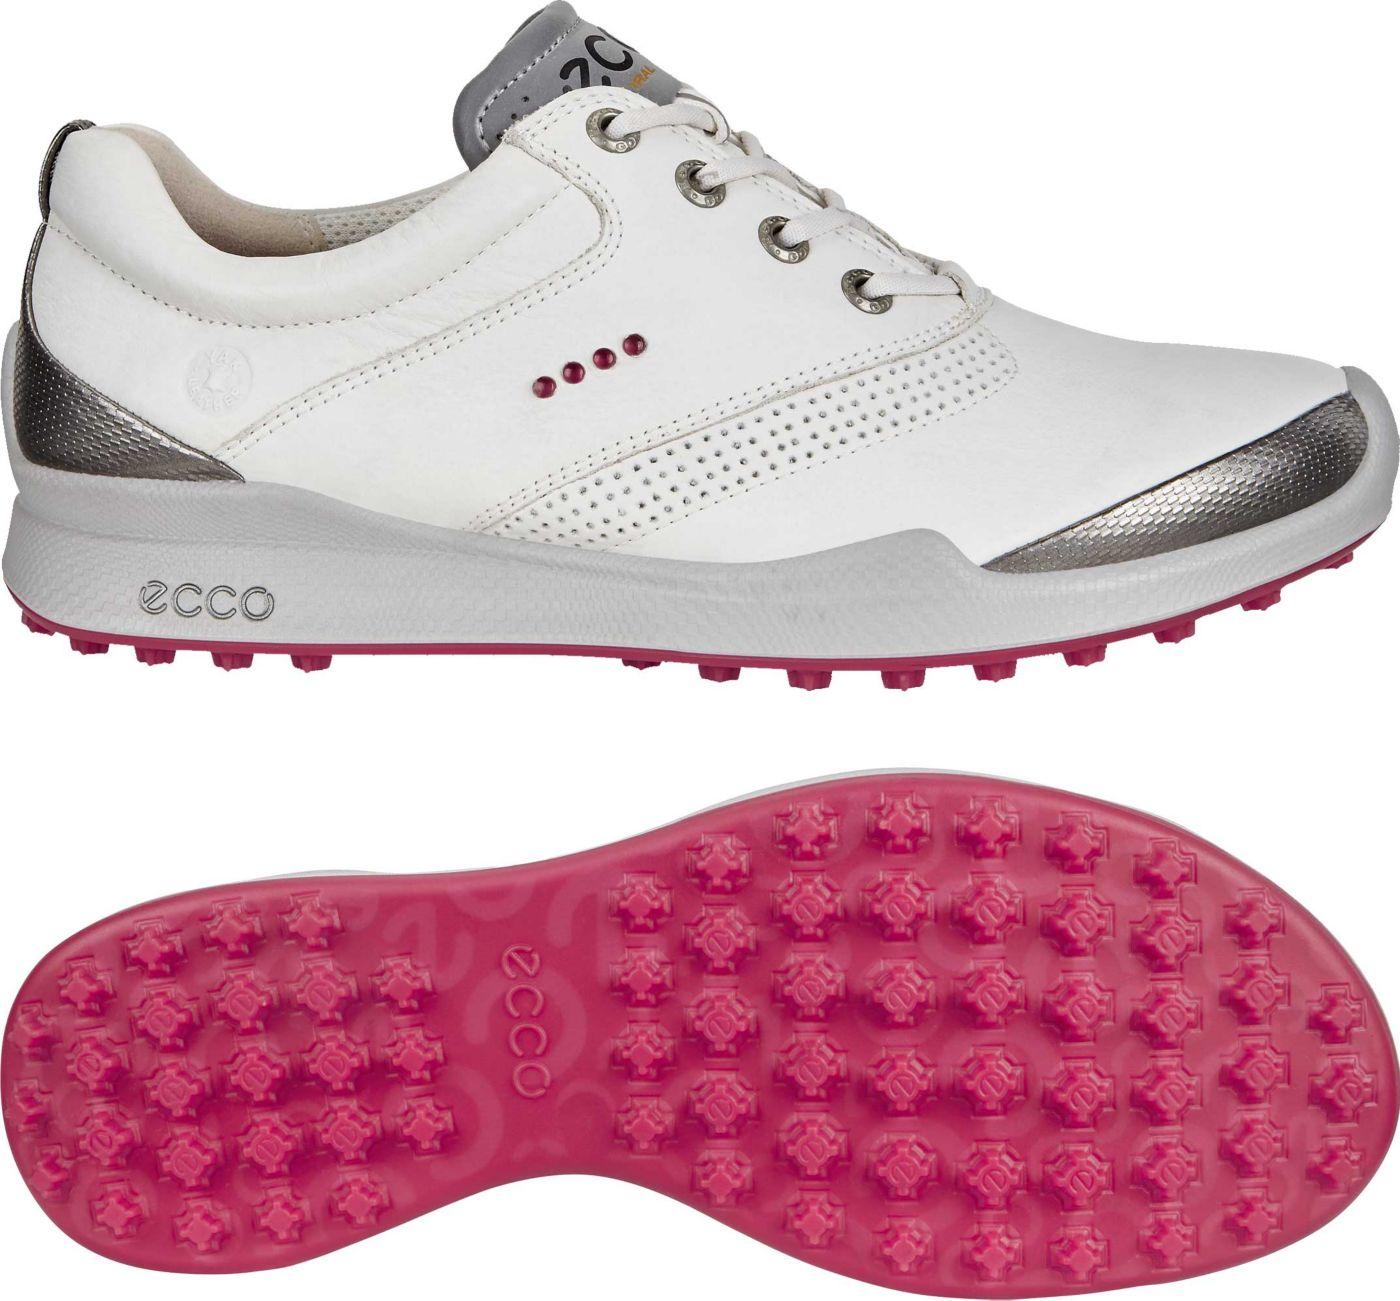 ECCO Women's BIOM Hybrid Golf Shoes